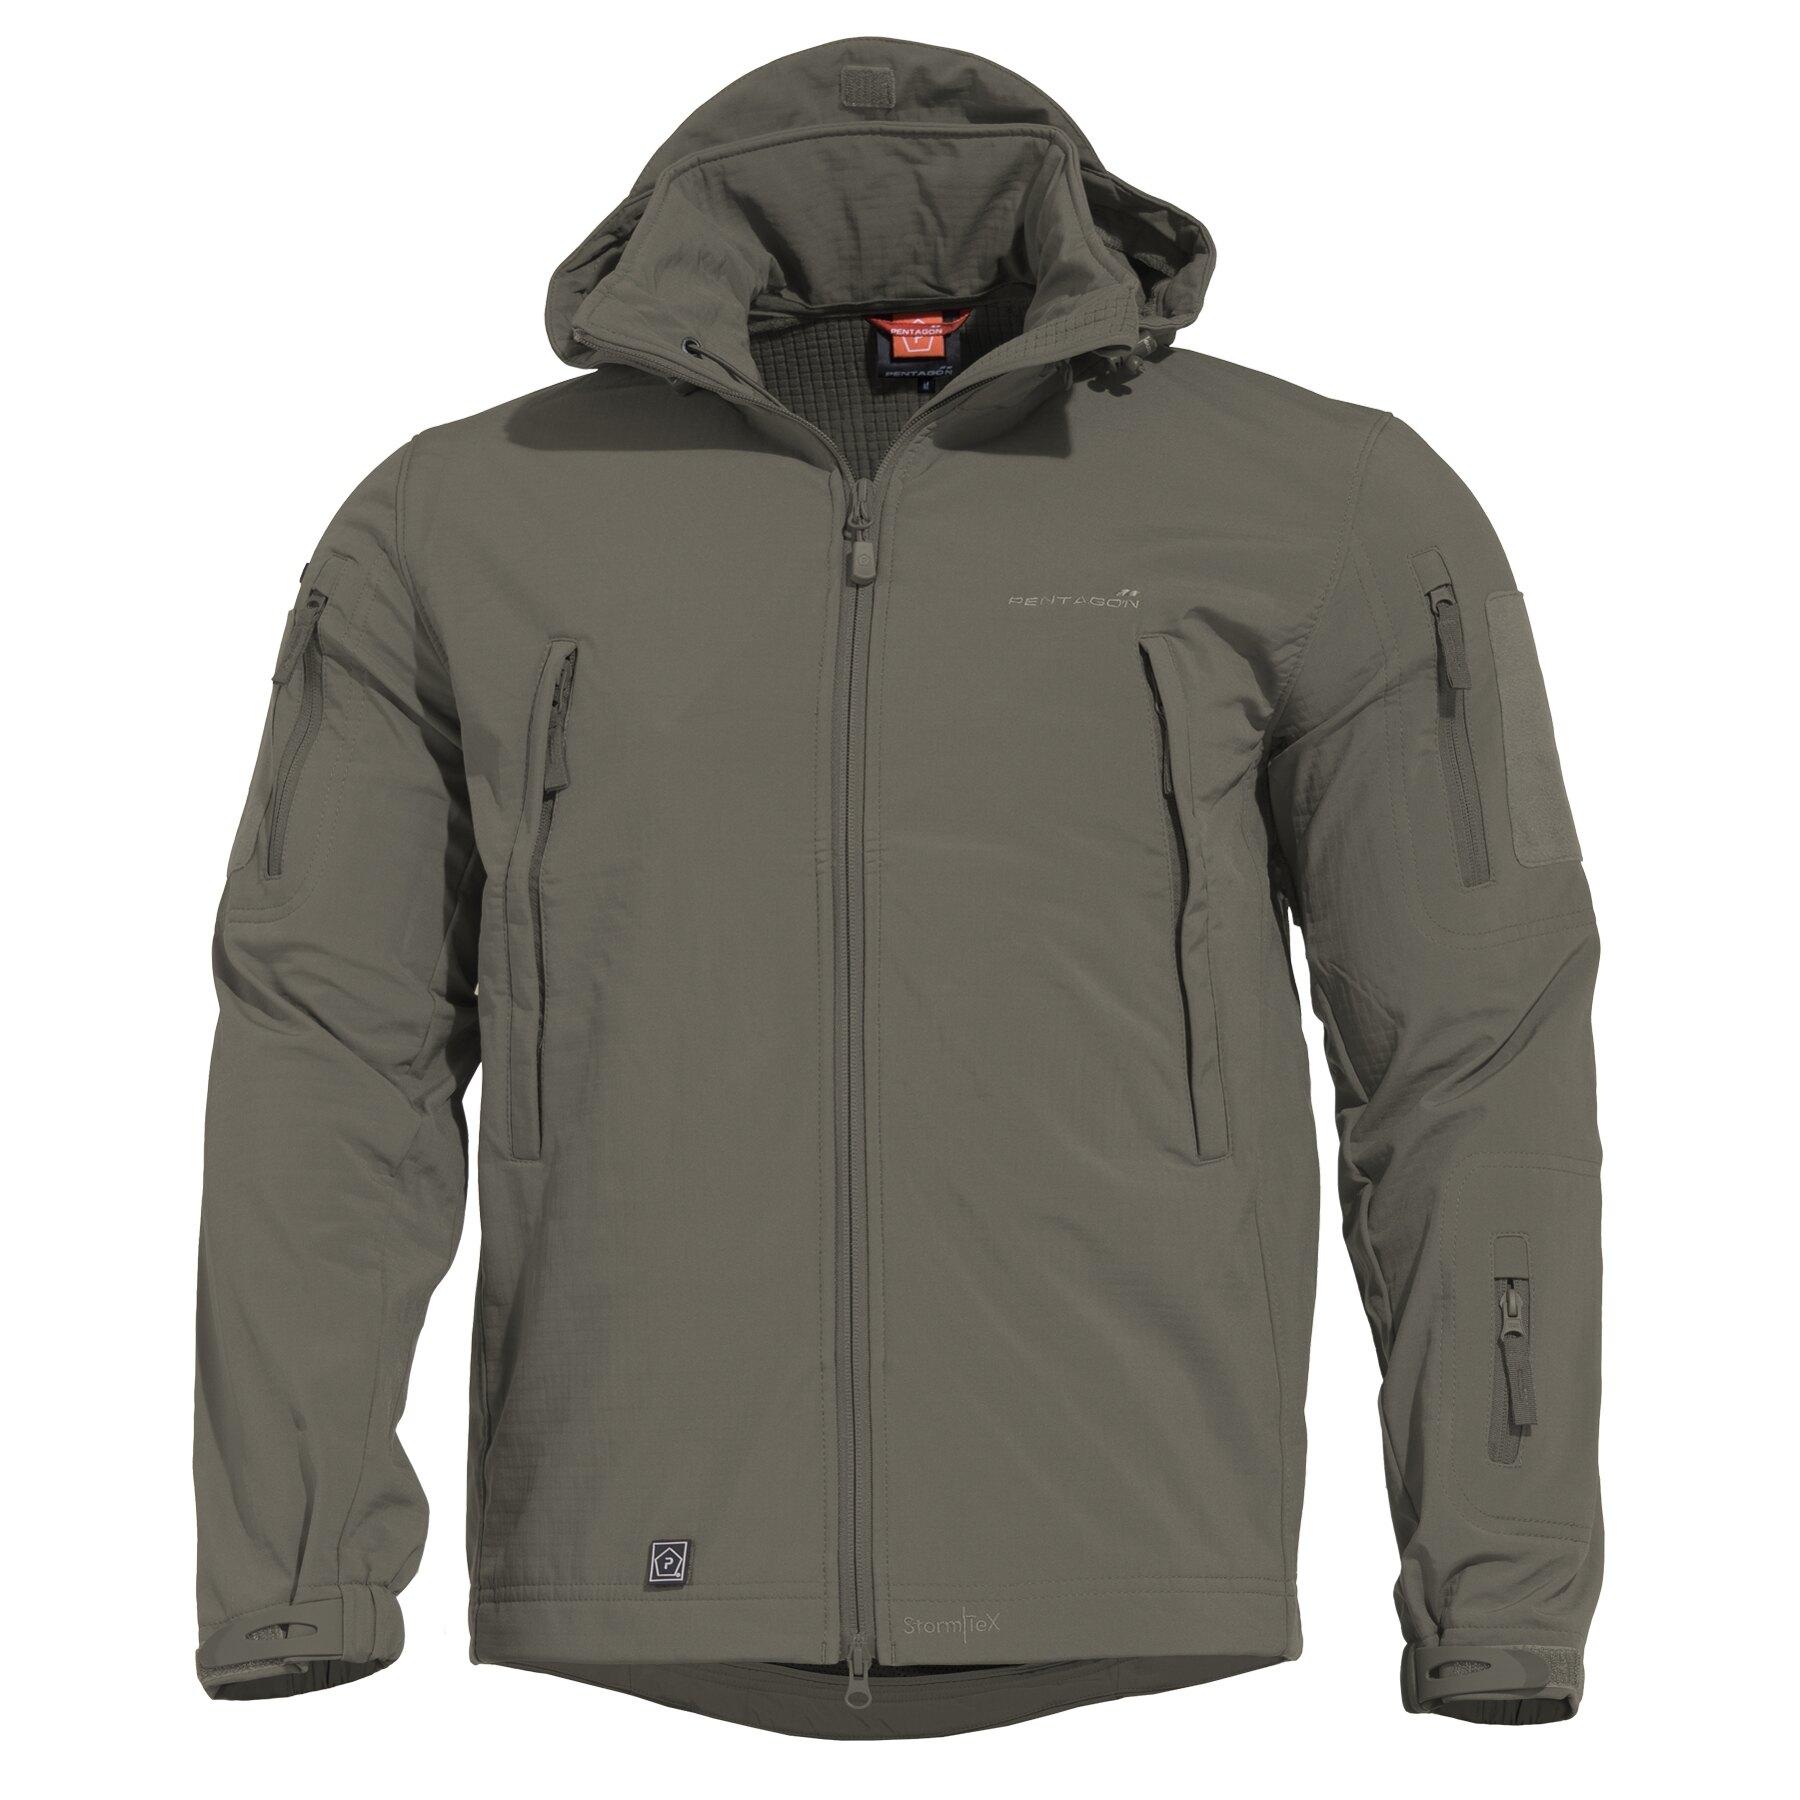 Taktická sofshellová bunda PENTAGON® ARTAXES SF Level IV – Grindle Green (Farba: Grindle Green, Veľkosť: S)